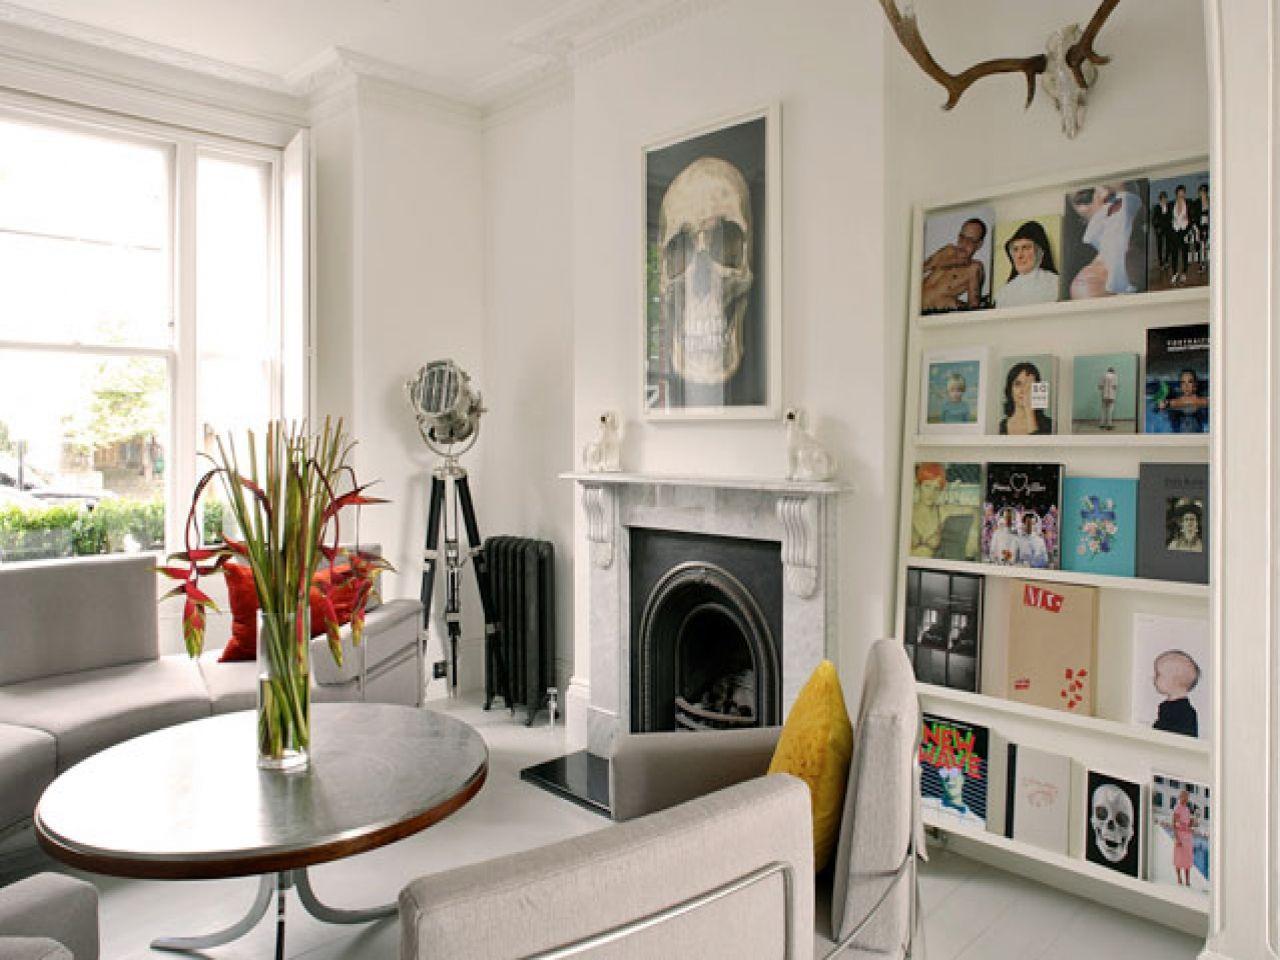 Bookshelf Decorating Ideas - Decor Around The World ...